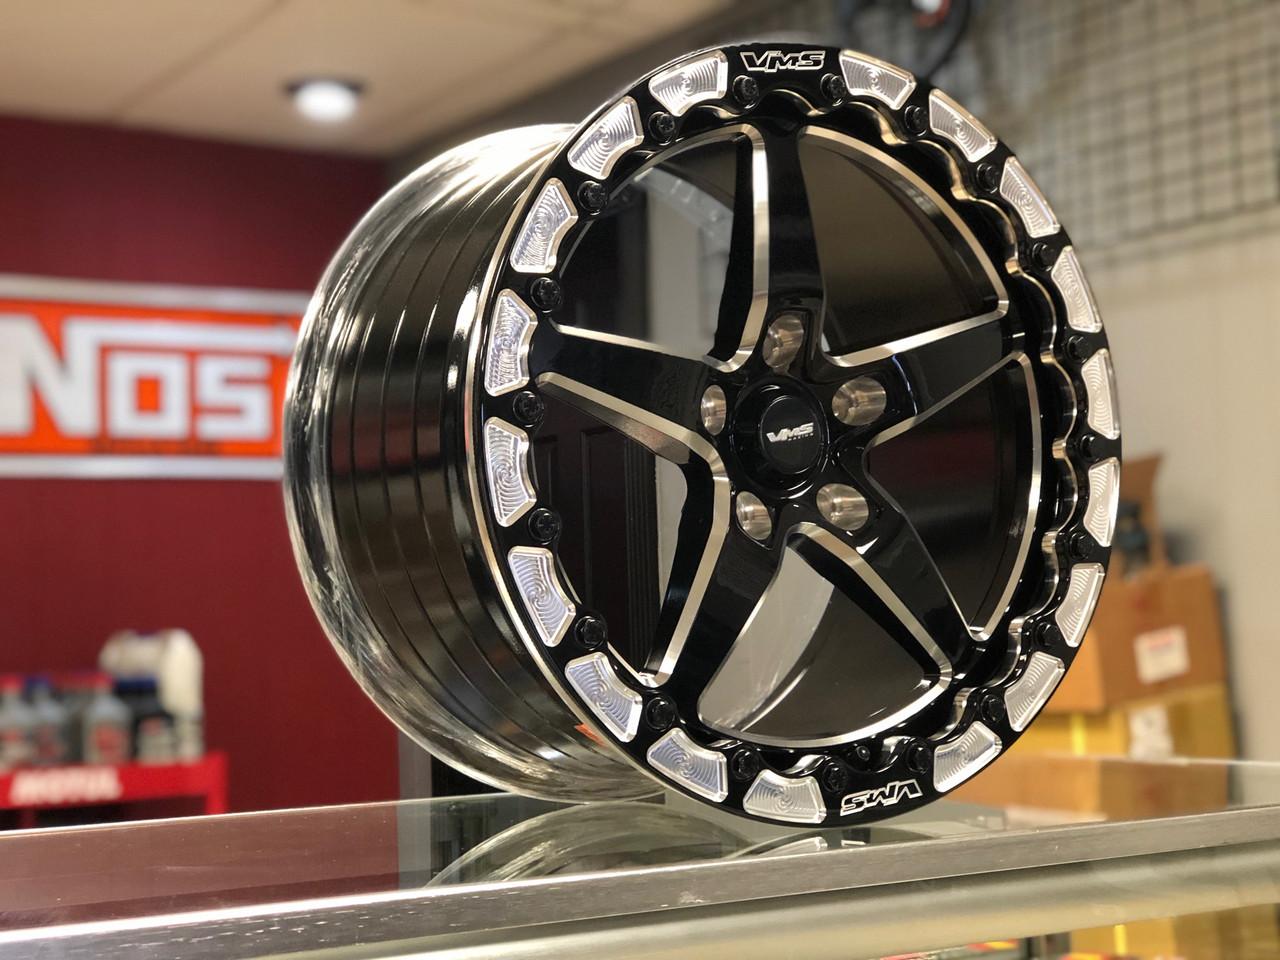 VMS 17x10 Rear Street Drag Race Wheel Beadlock Dodge Charger Challenger Hellcat